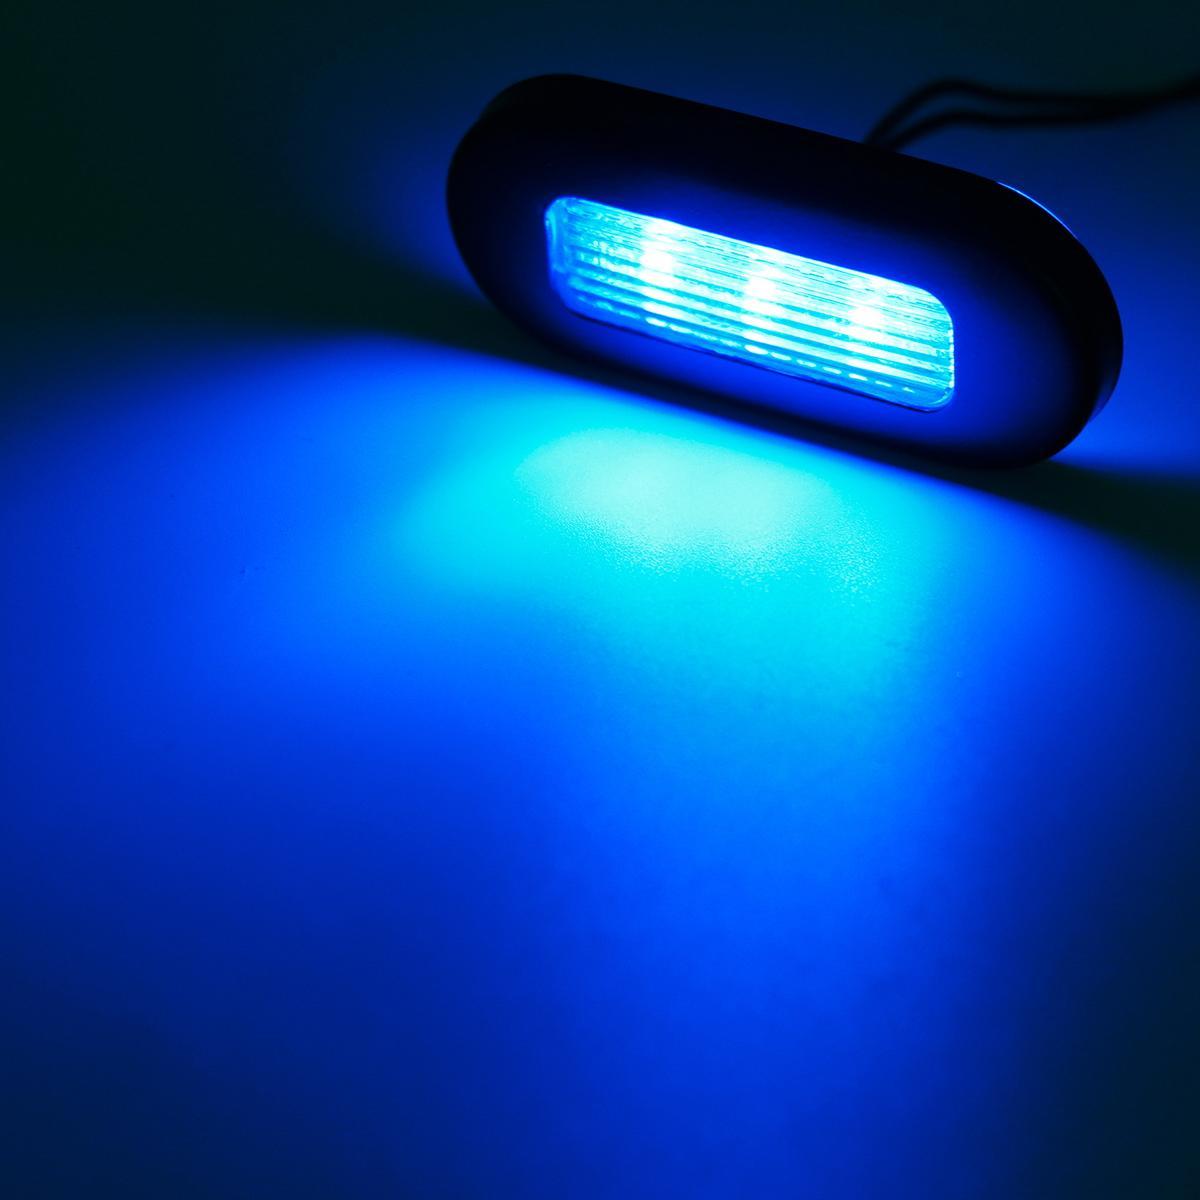 Diablo Led Boat Lights: 4) Marine Boat Blue LED Oblong Courtesy Light Stair Deck